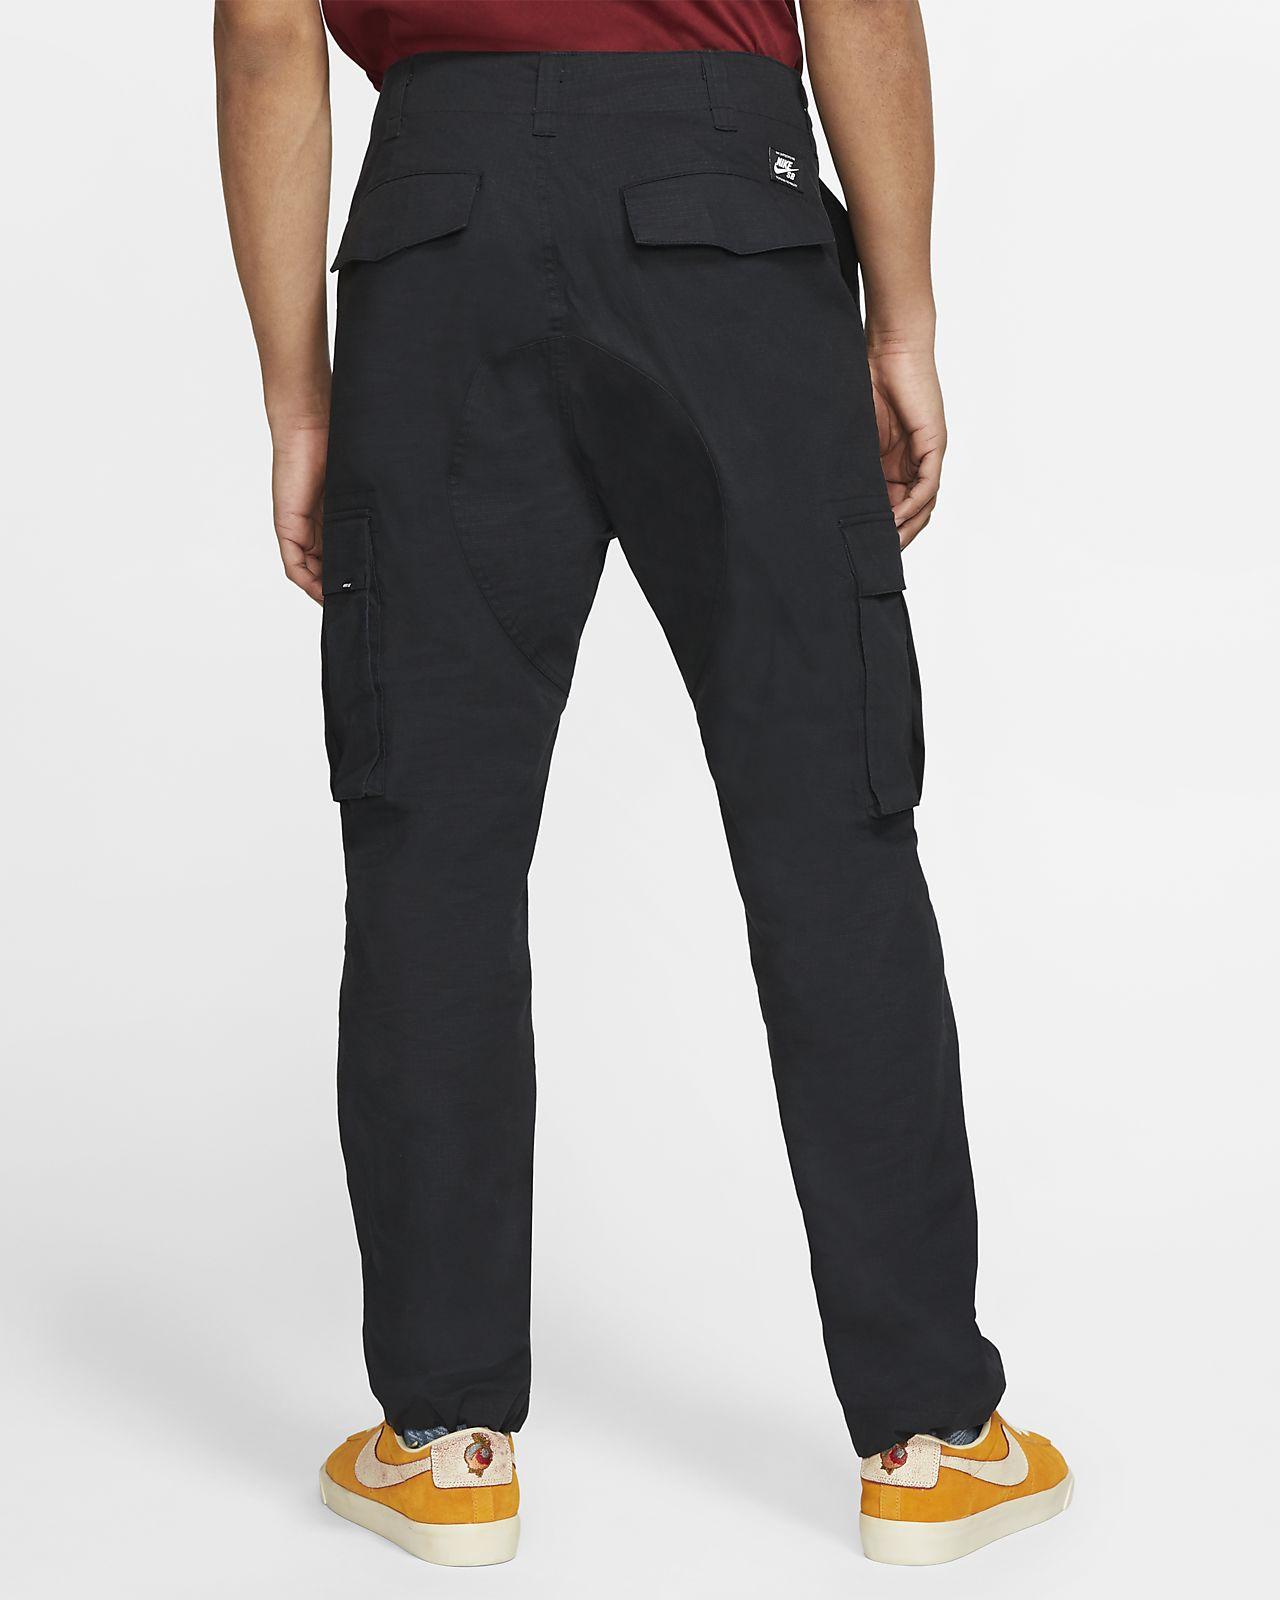 Nike Nike Tech Pack Cargo Woven Men's Pants Size 32 $90